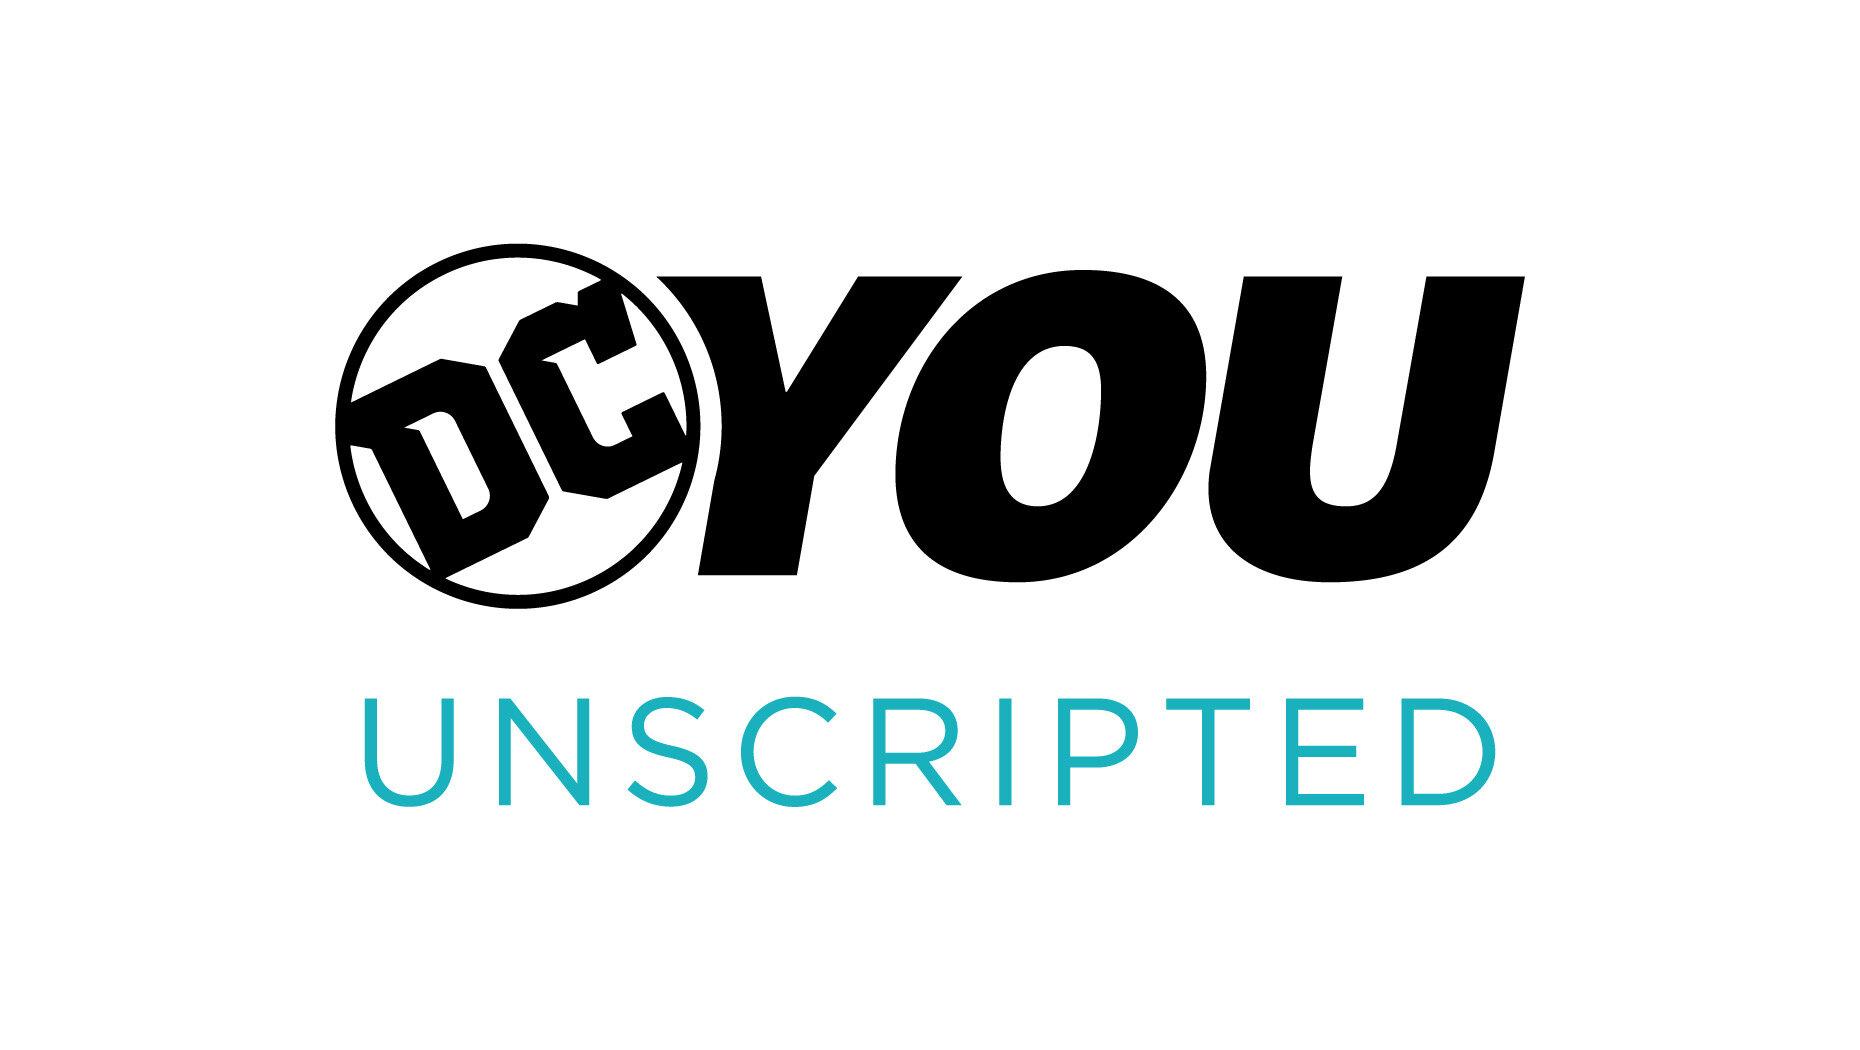 DCYOU Unscripted Logo.jpeg